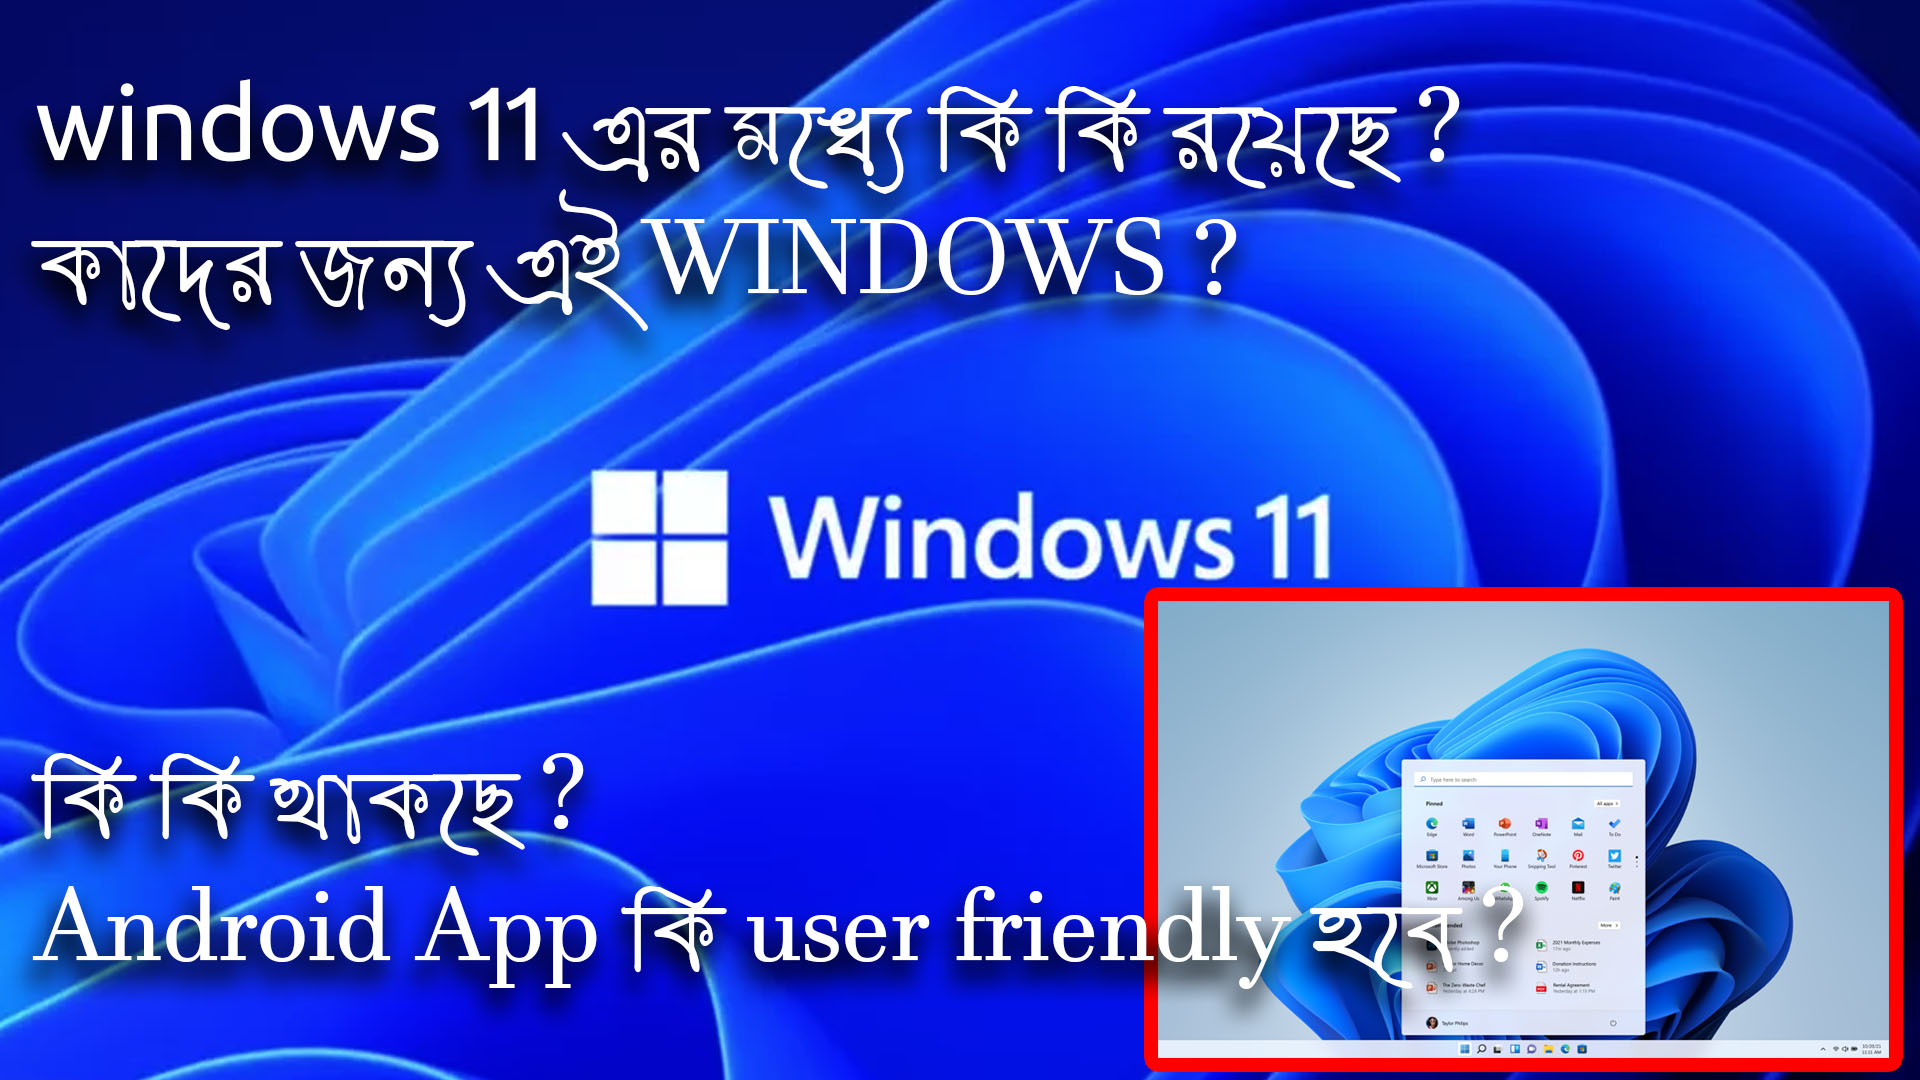 windows 11 এর সব তথ্য